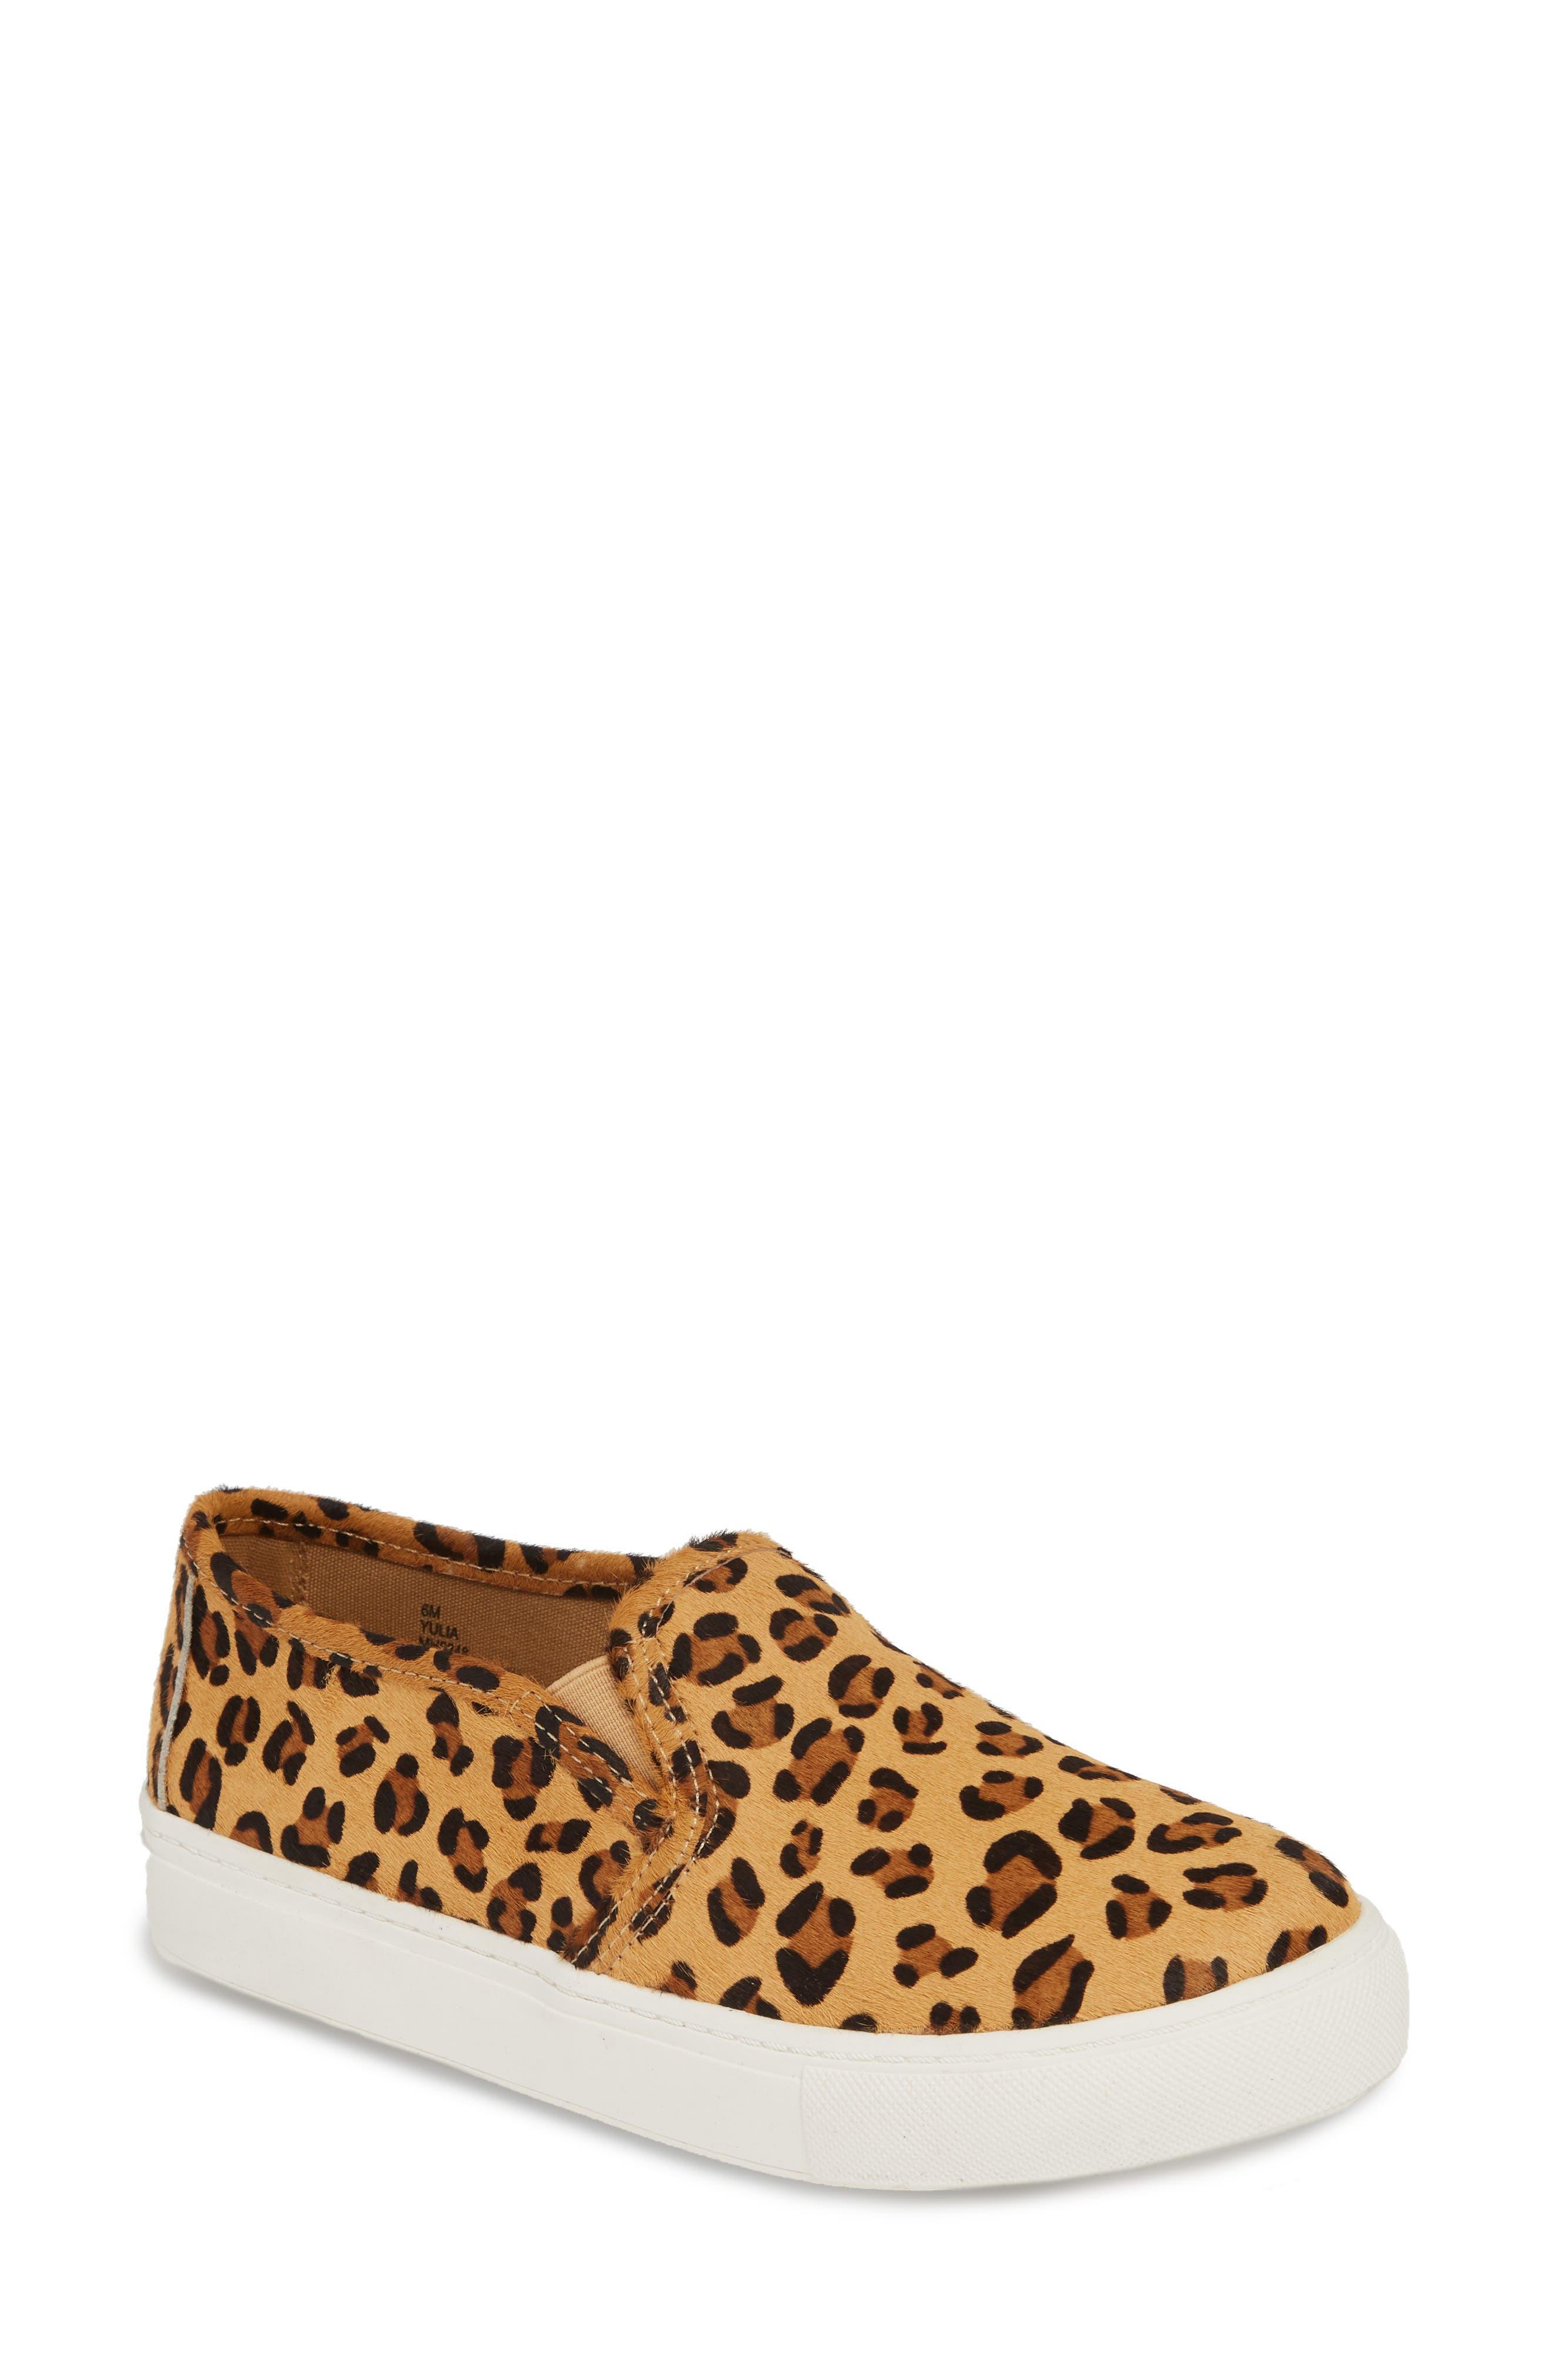 Mia Yulia Genuine Calf Hair Platform Sneaker, Brown